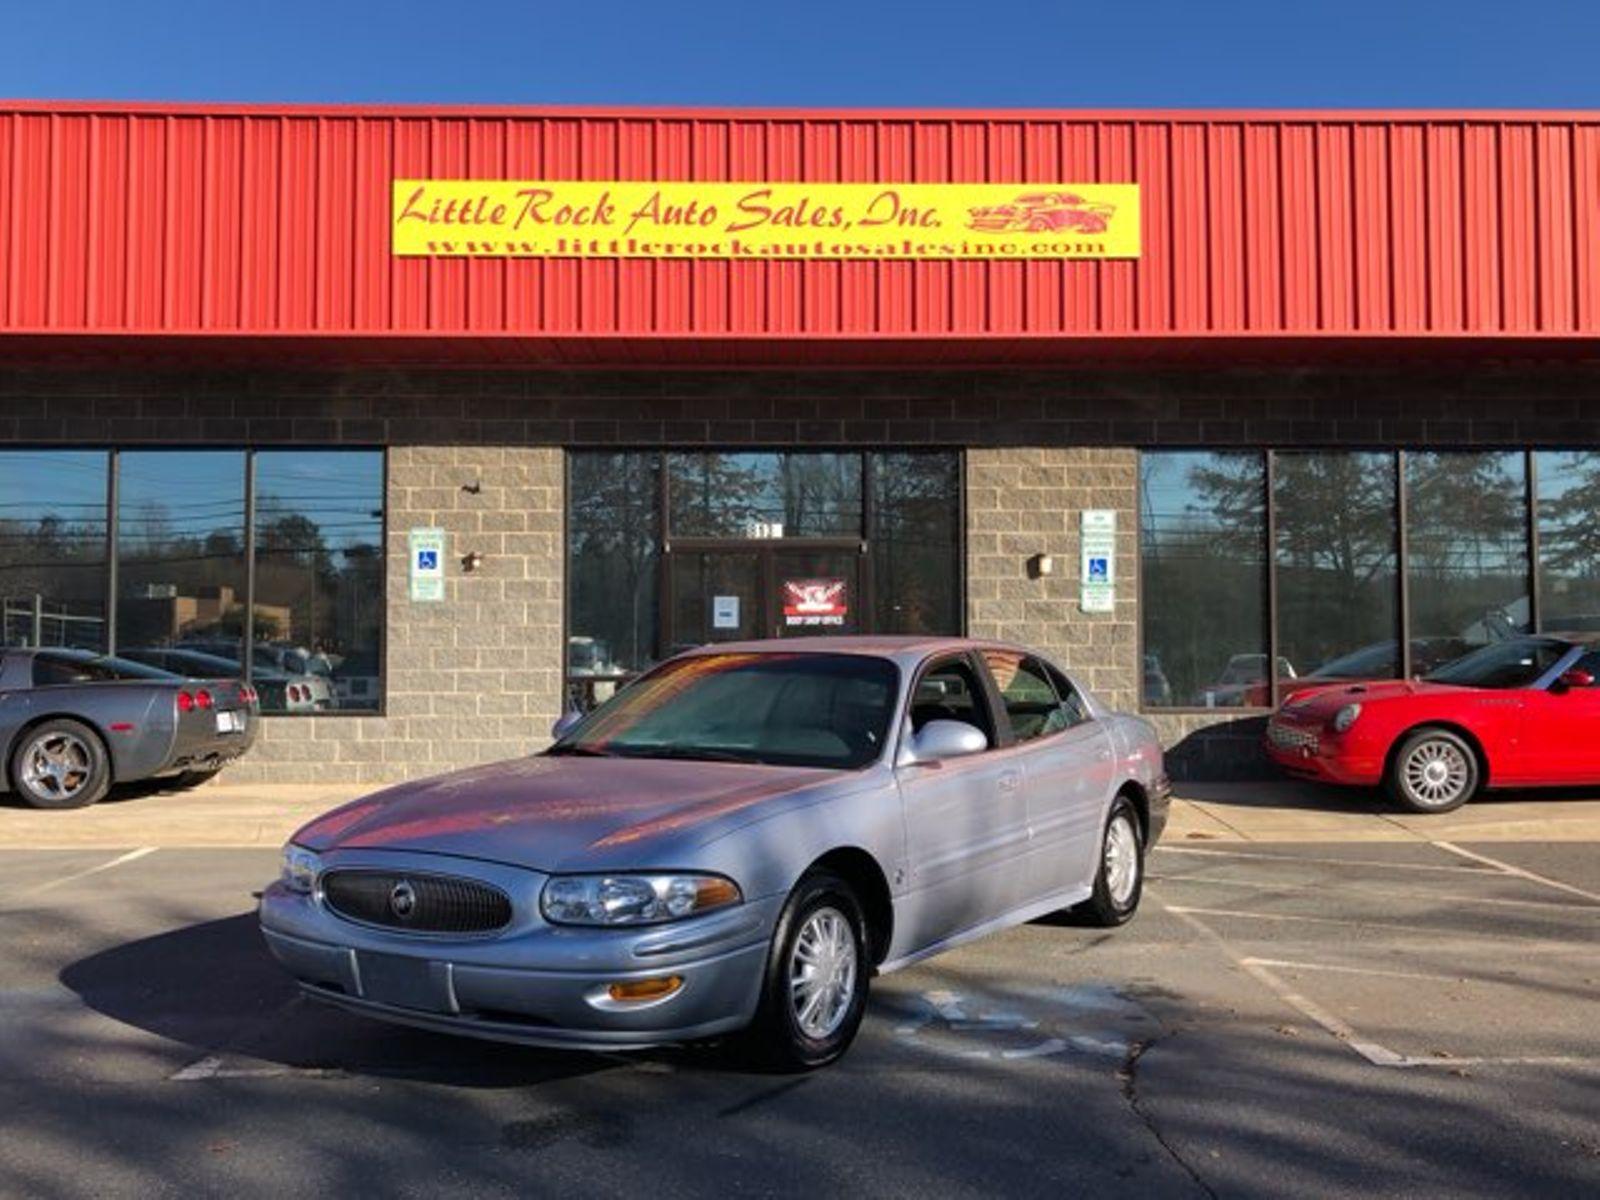 2005 Buick Lesabre Custom City Nc Little Rock Auto Sales Inc